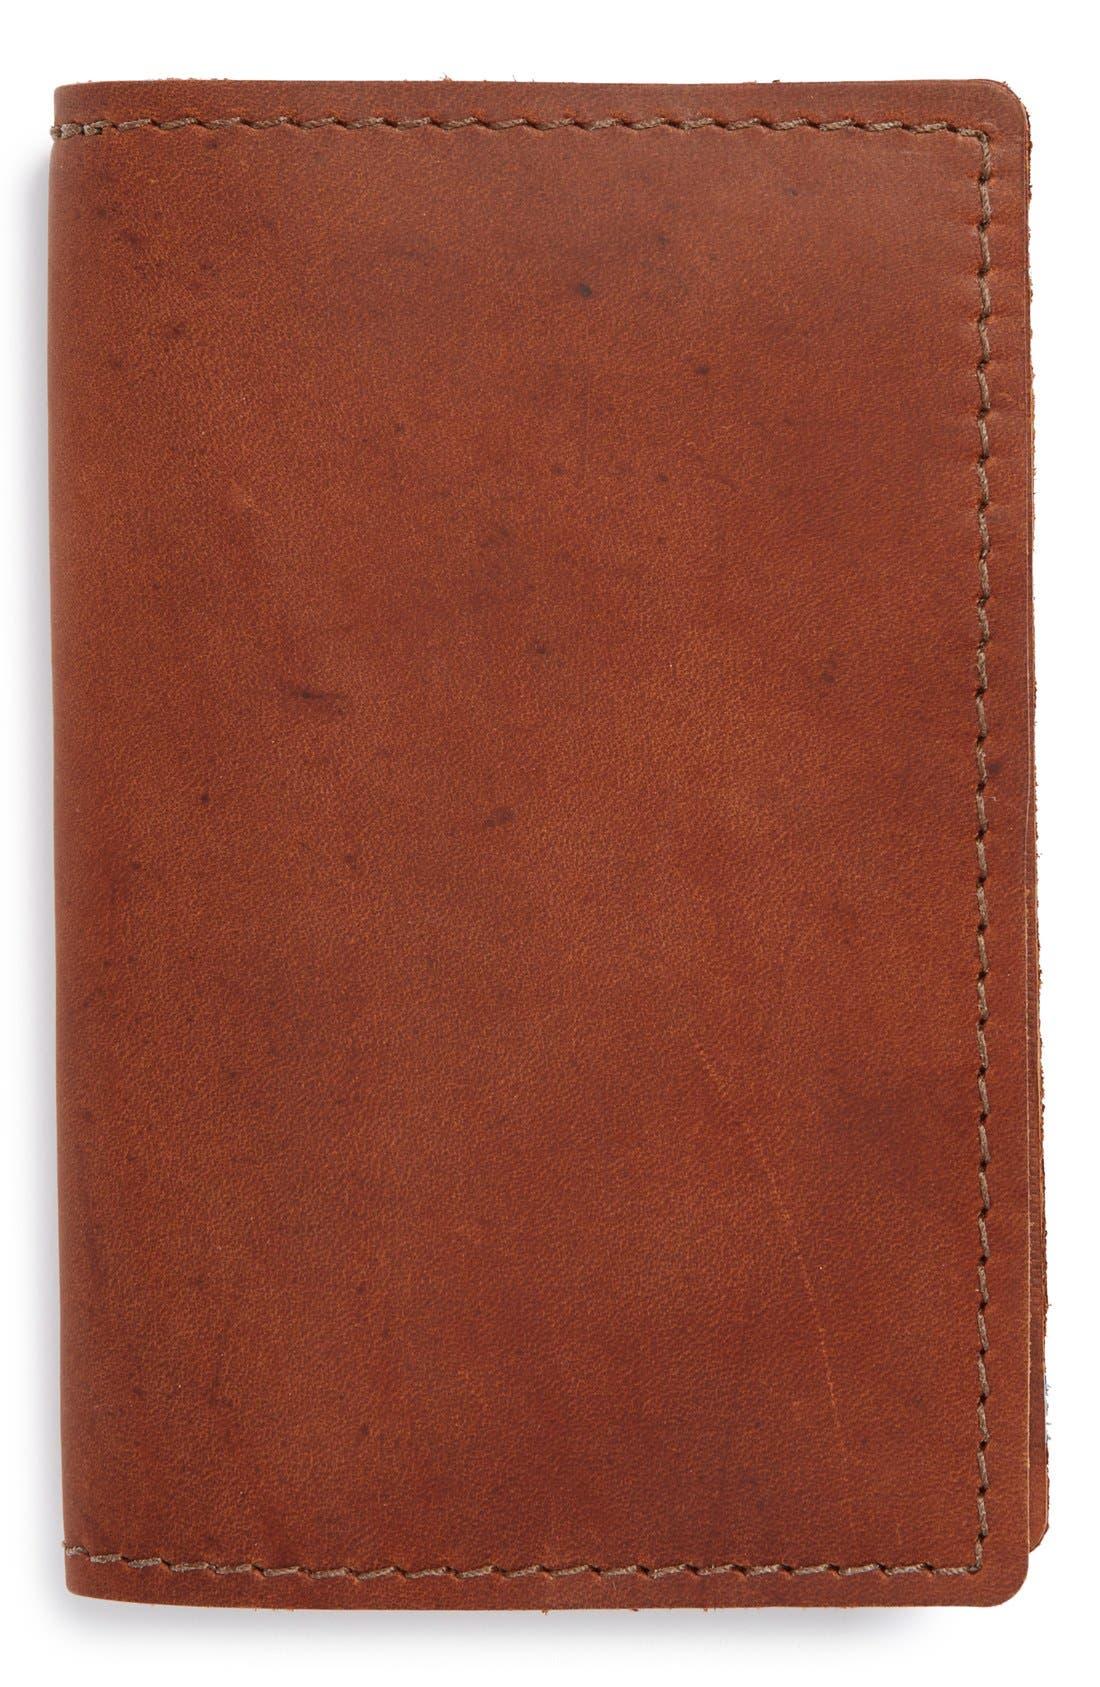 Alternate Image 1 Selected - Rustico Field Note Portfolio